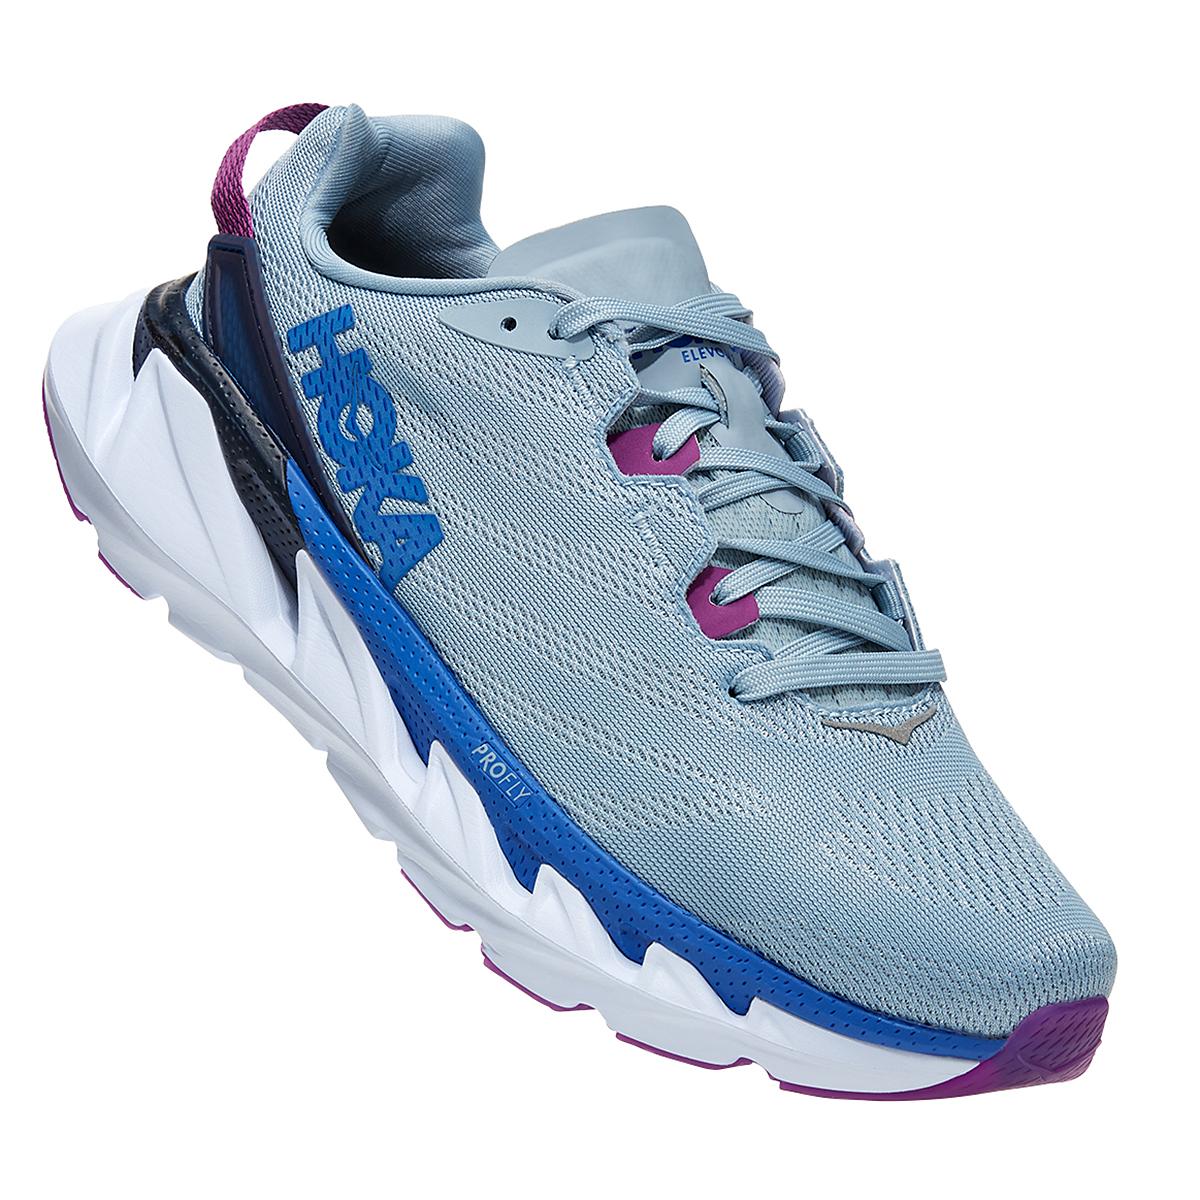 Women's Hoka One One Elevon 2 Running Shoe - Color: Ballad Blue - Size: 5 - Width: Regular, Ballad Blue, large, image 3